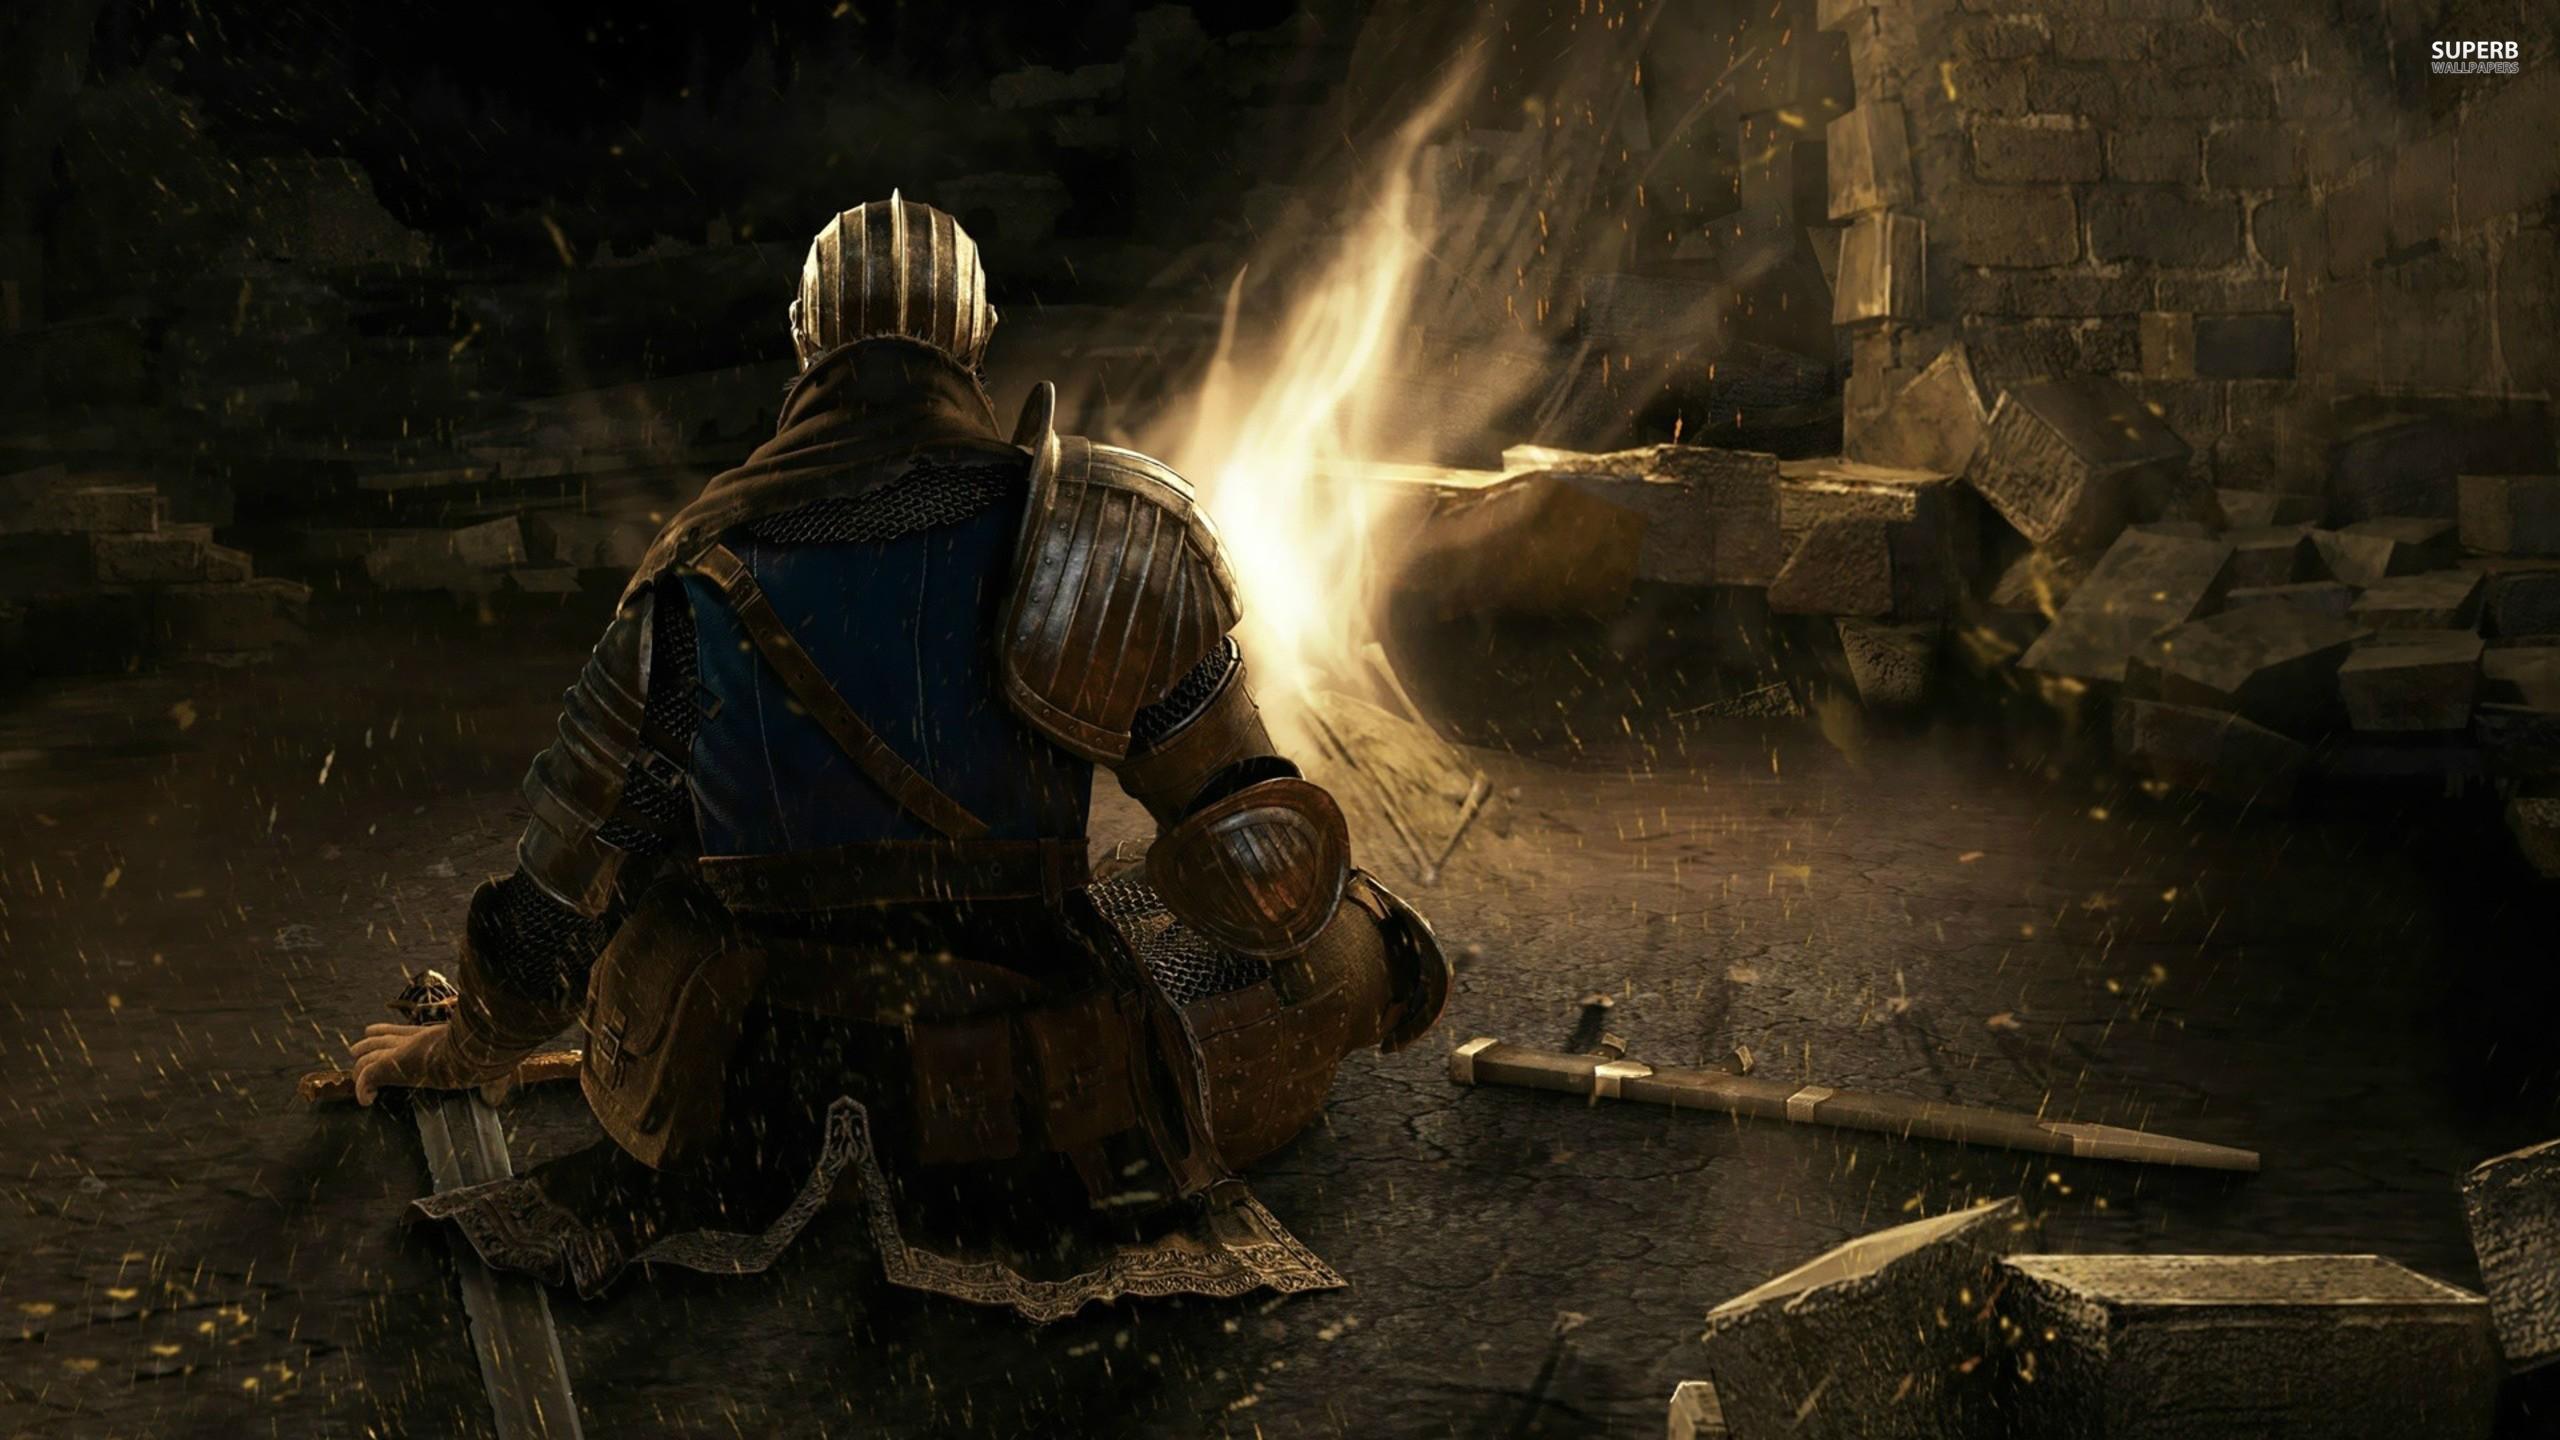 Dark Souls HD Wallpapers 69 Images